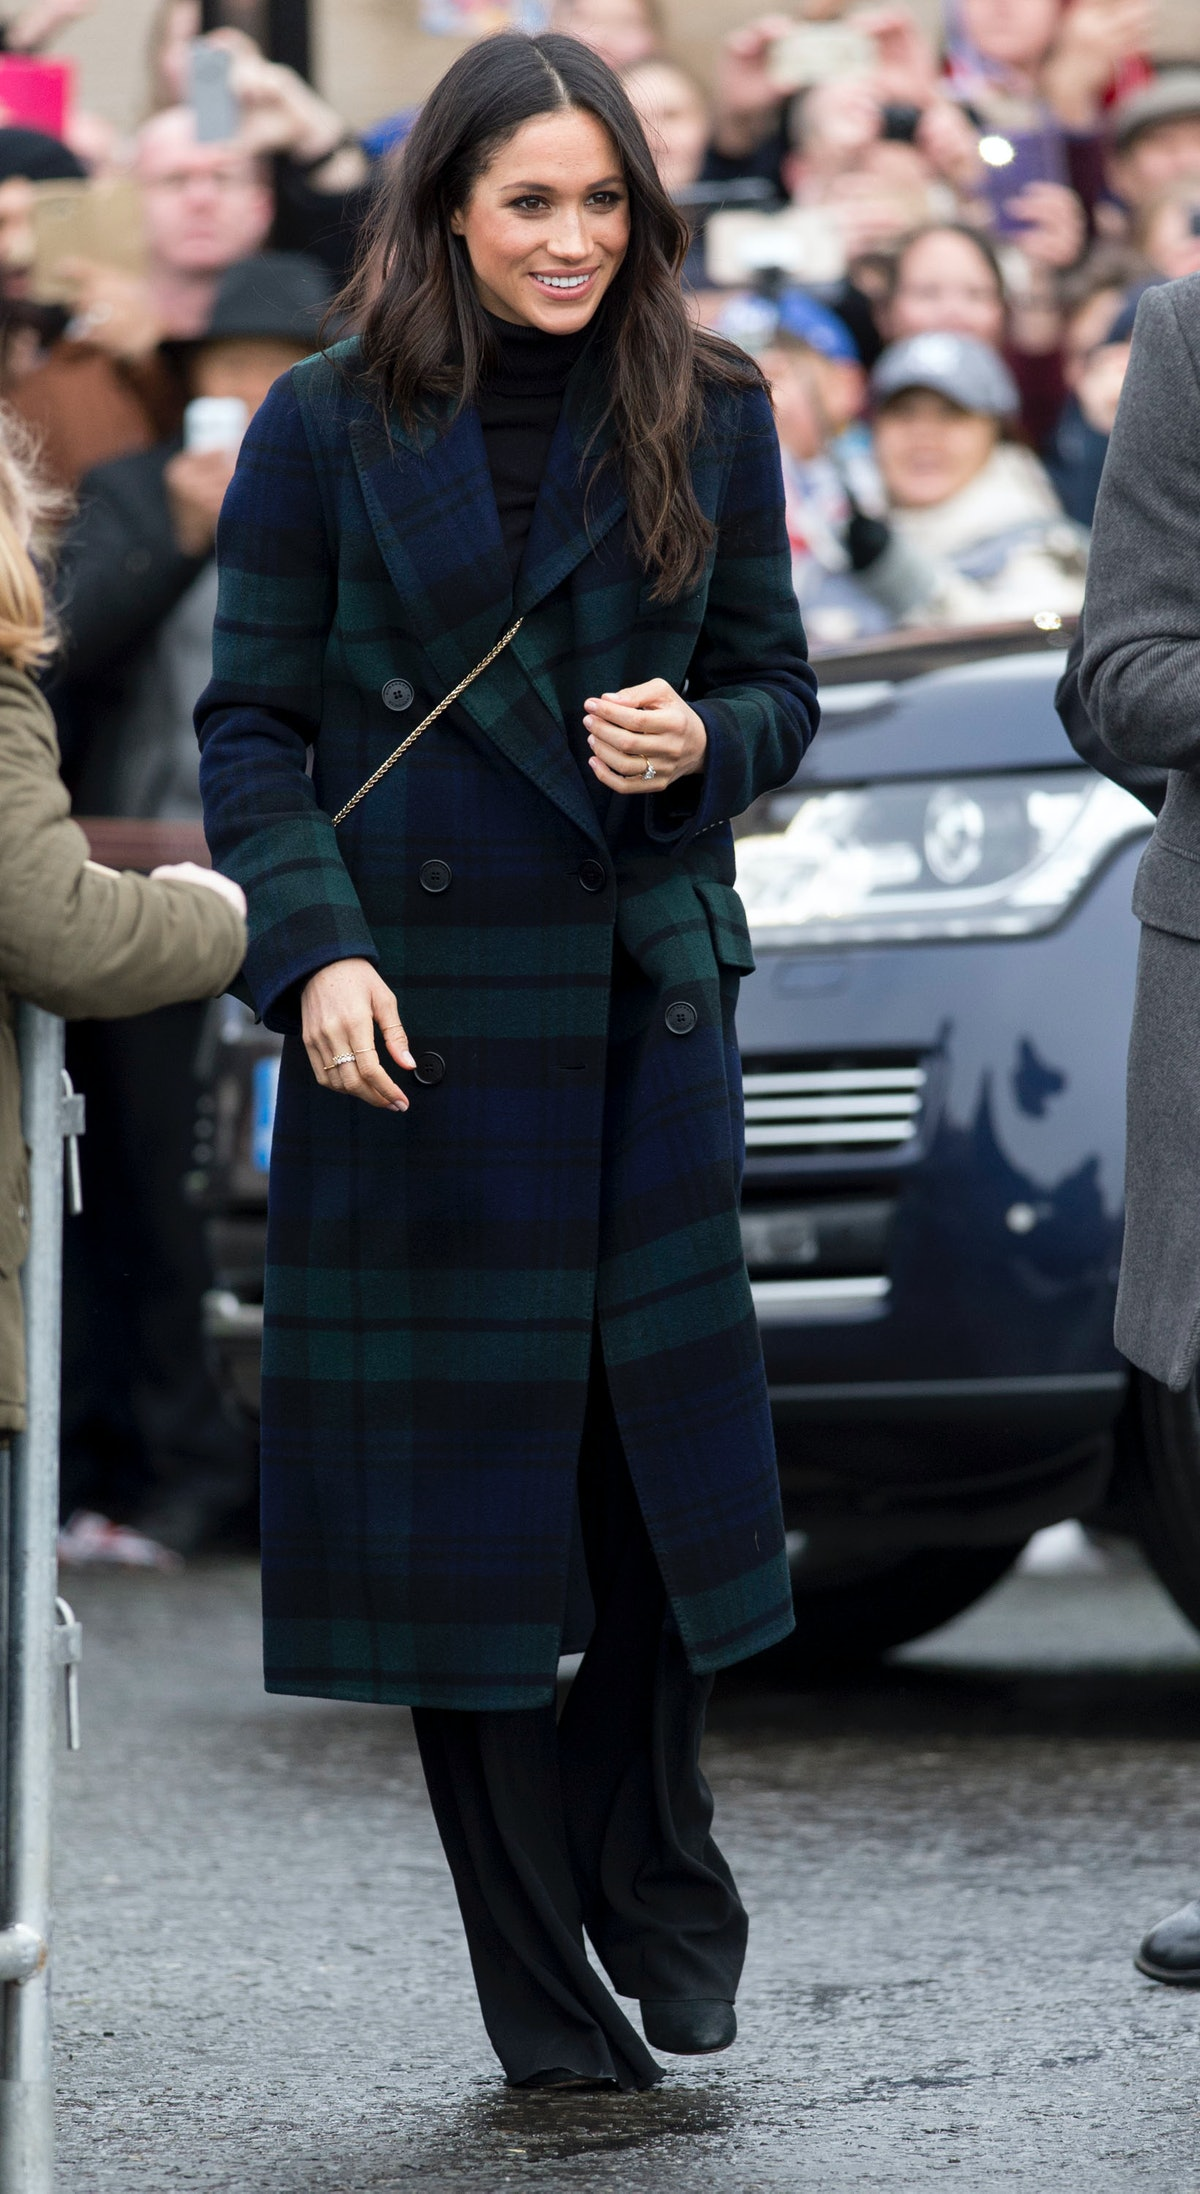 Meghan Markle dressed in a tartan plaid wool coat on a visit to Edinburgh in February 2018.